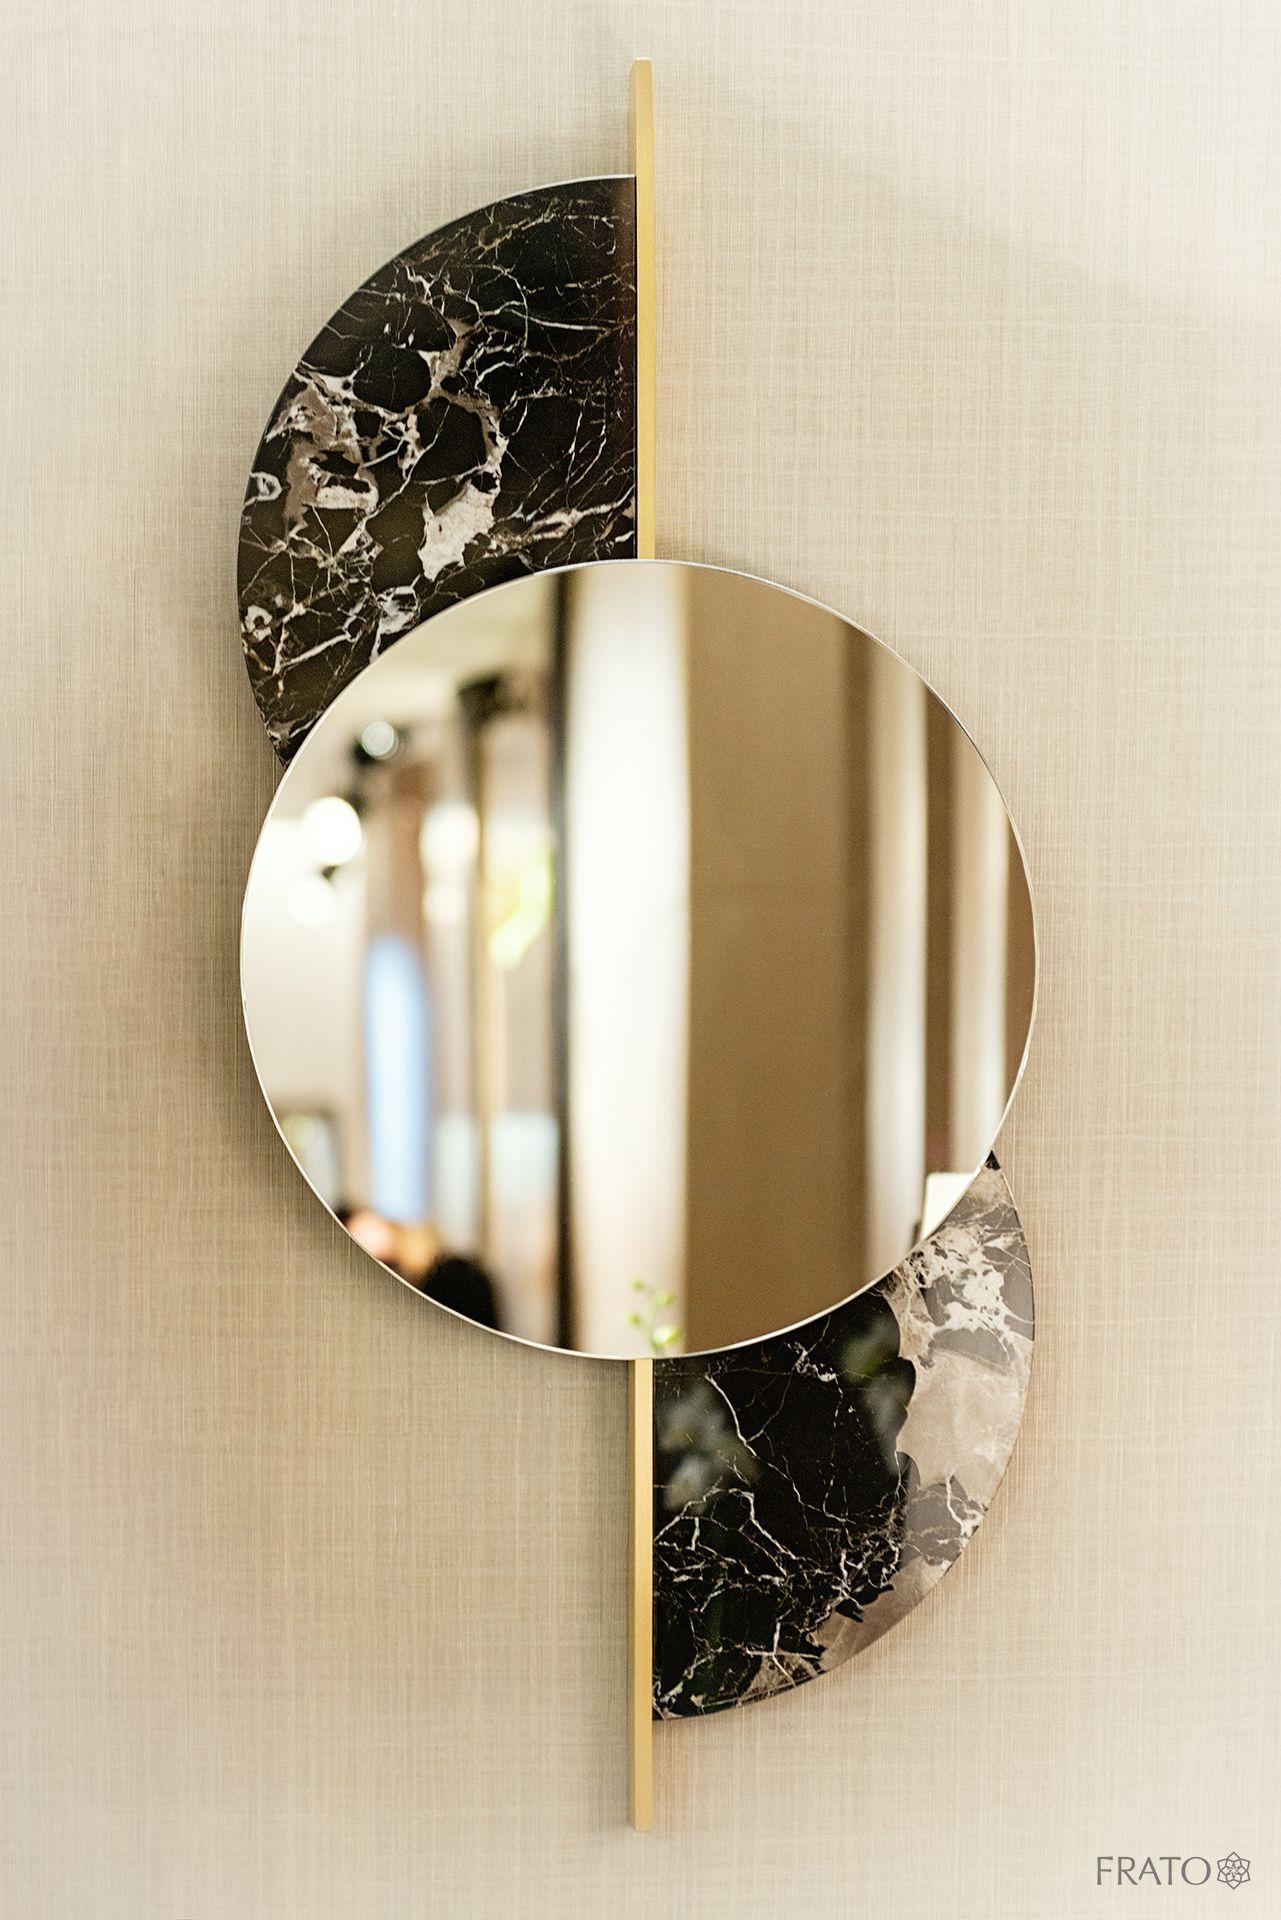 FRATO's elegant interiors at Maison & Objet Paris January 2019 www.frato-interiors.com #frato #fratointeriors #homedecor #harrods #interiordesign #furniture #furnituredesign #hospitalitydesign #livingroominspo #interior4all #homedesign #decorating #designlovers #interiordecoration #interiorinspo #hoteldesign #architecturaldigest #vogueliving #adrussia #maisonetobjet #maisonetobjet2019 #MO19 #mo19beststand #salonedelmobile #isaloni